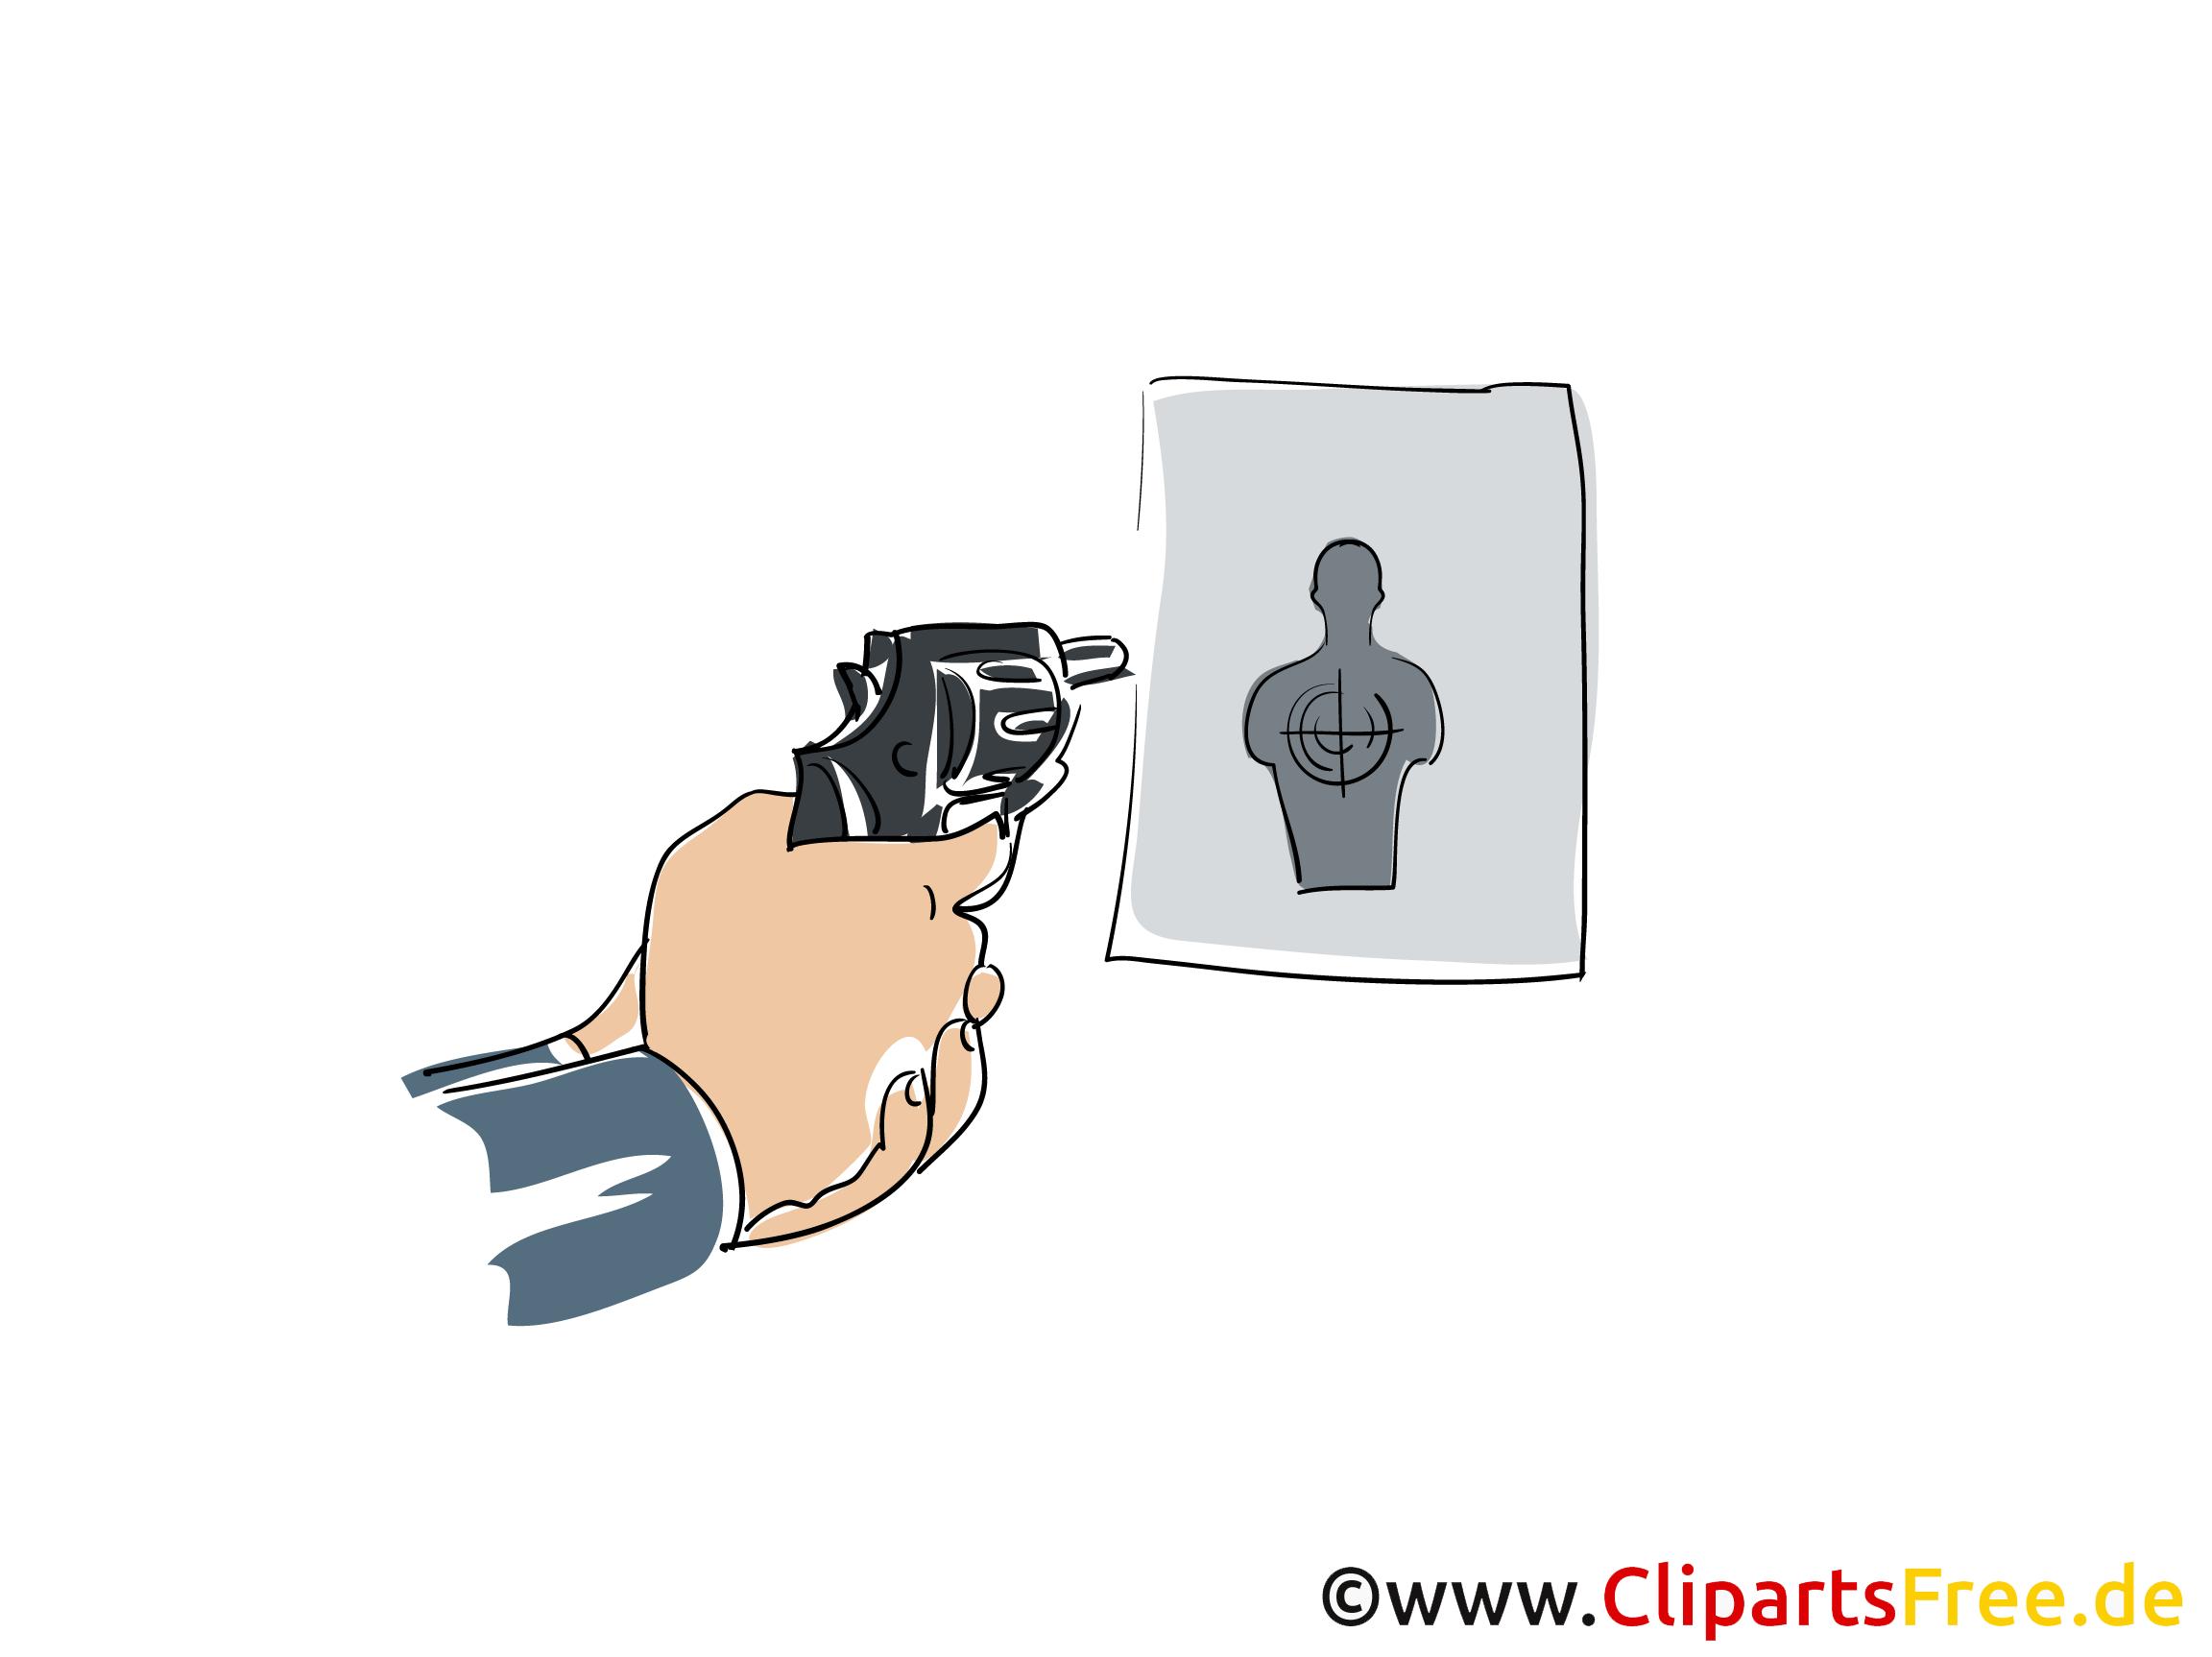 Schießübung Clipart, Bild, Buchillustration, Grafik, Cartoon, Comic